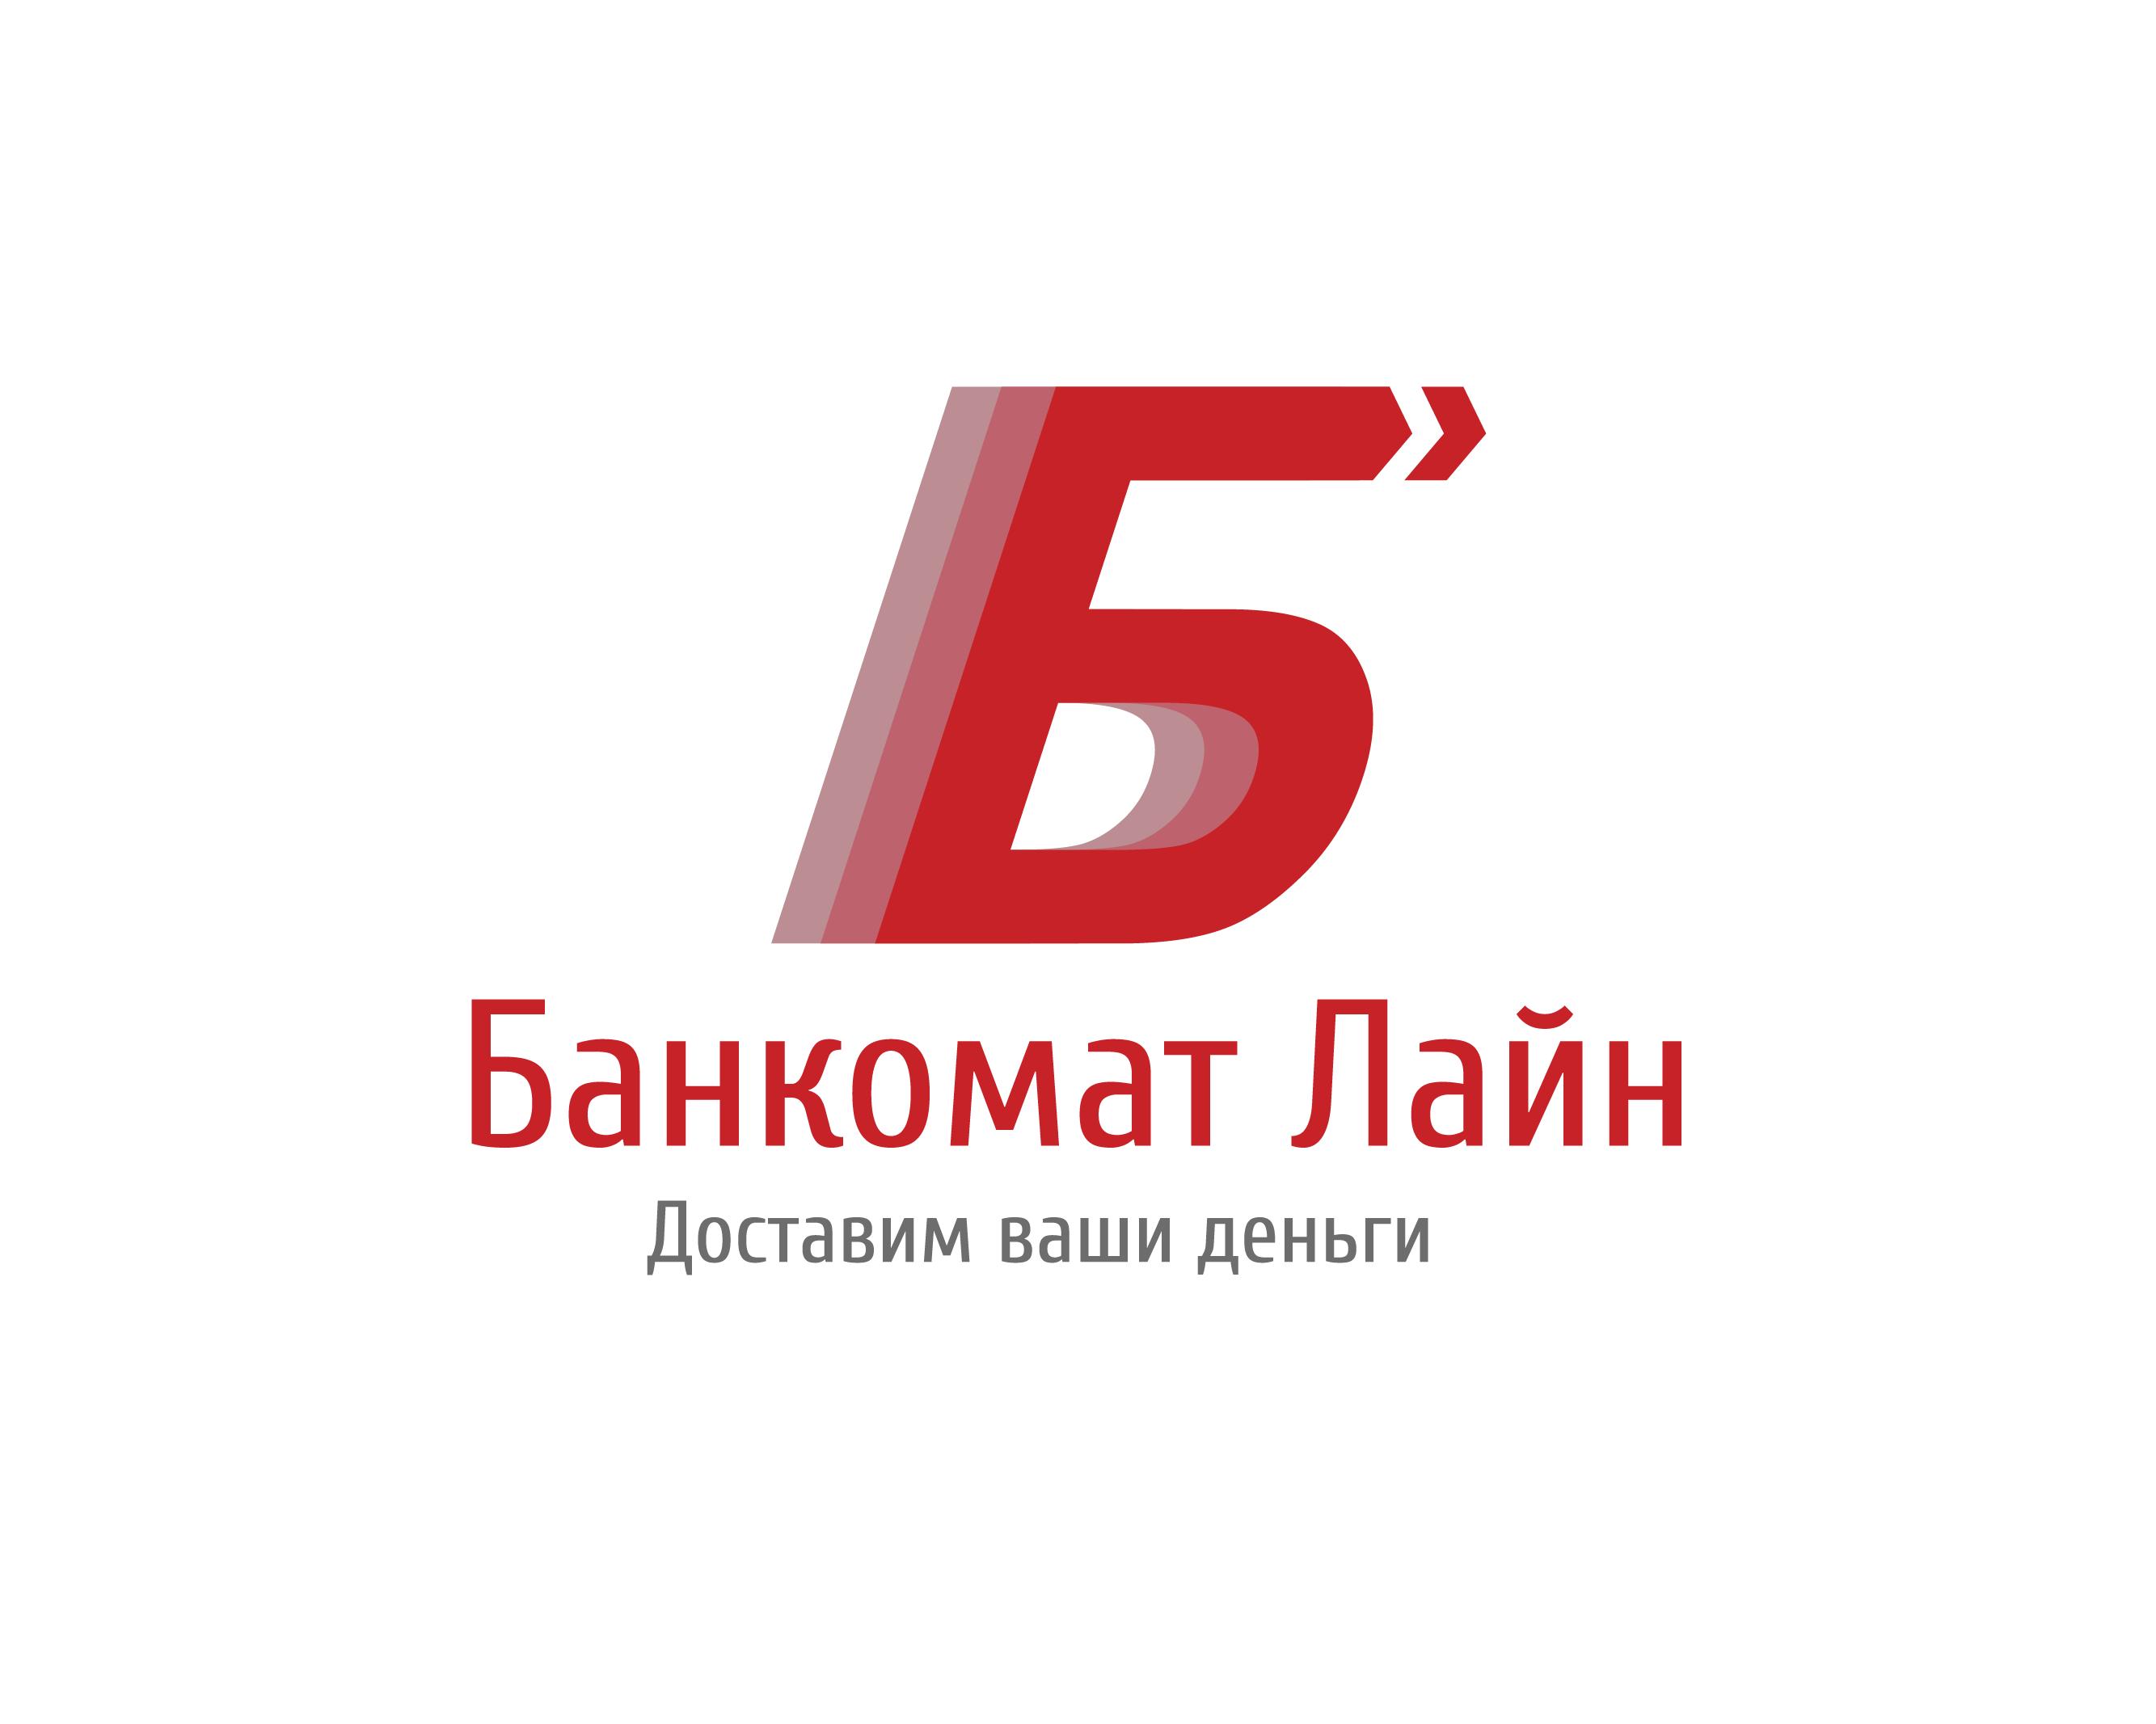 Разработка логотипа и слогана для транспортной компании фото f_48458777cf924ea7.png